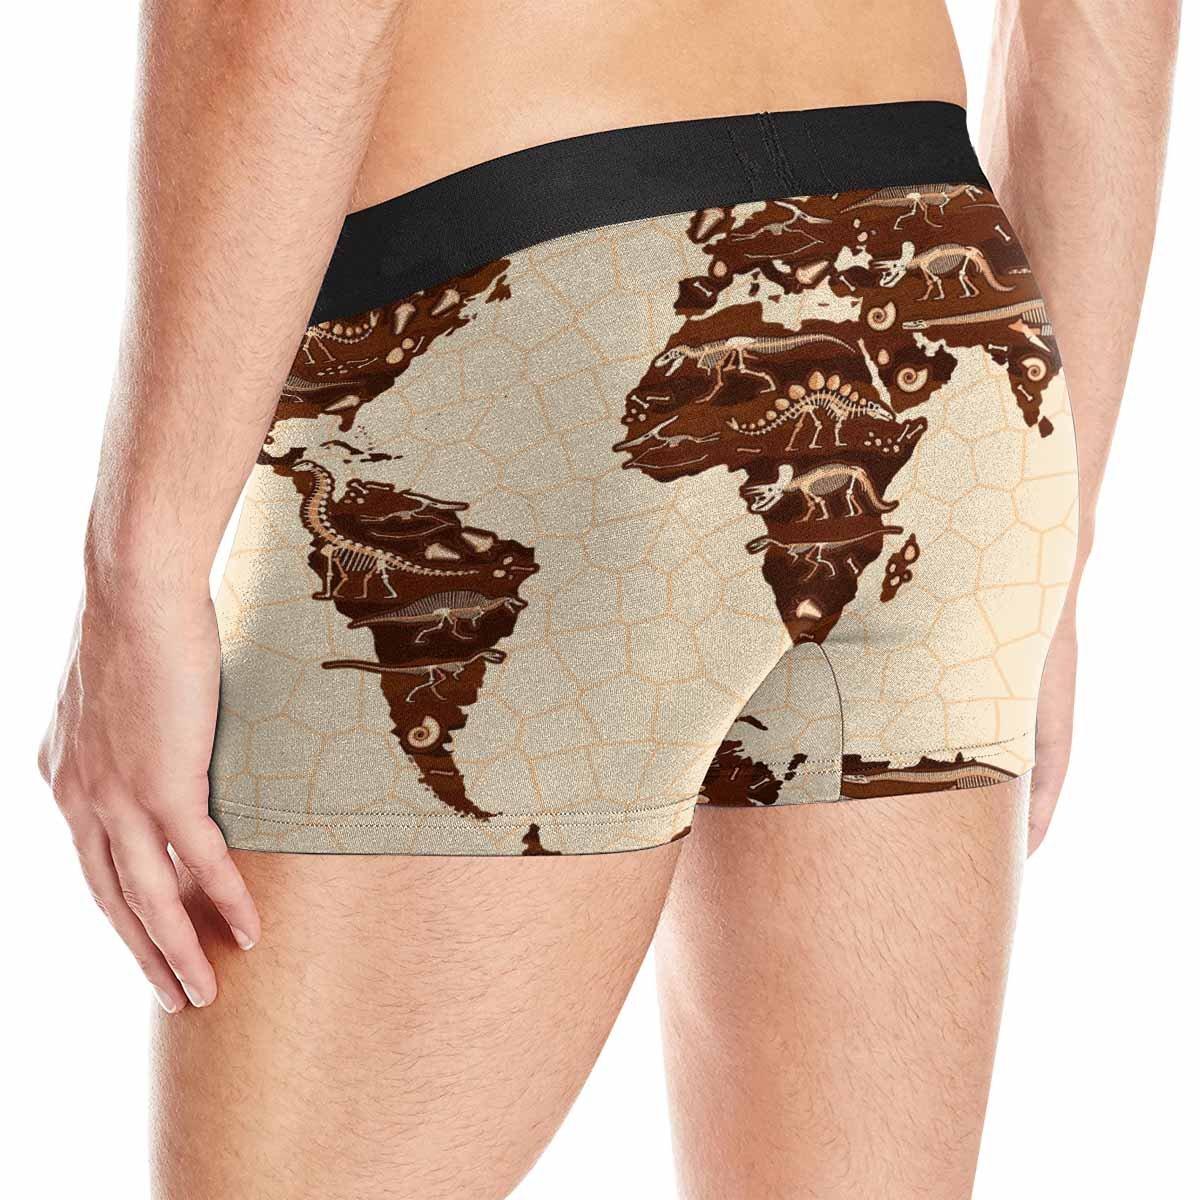 XS-3XL INTERESTPRINT Mens Boxer Briefs Underwear Cartoon World Map with Dinosaurs for Kids